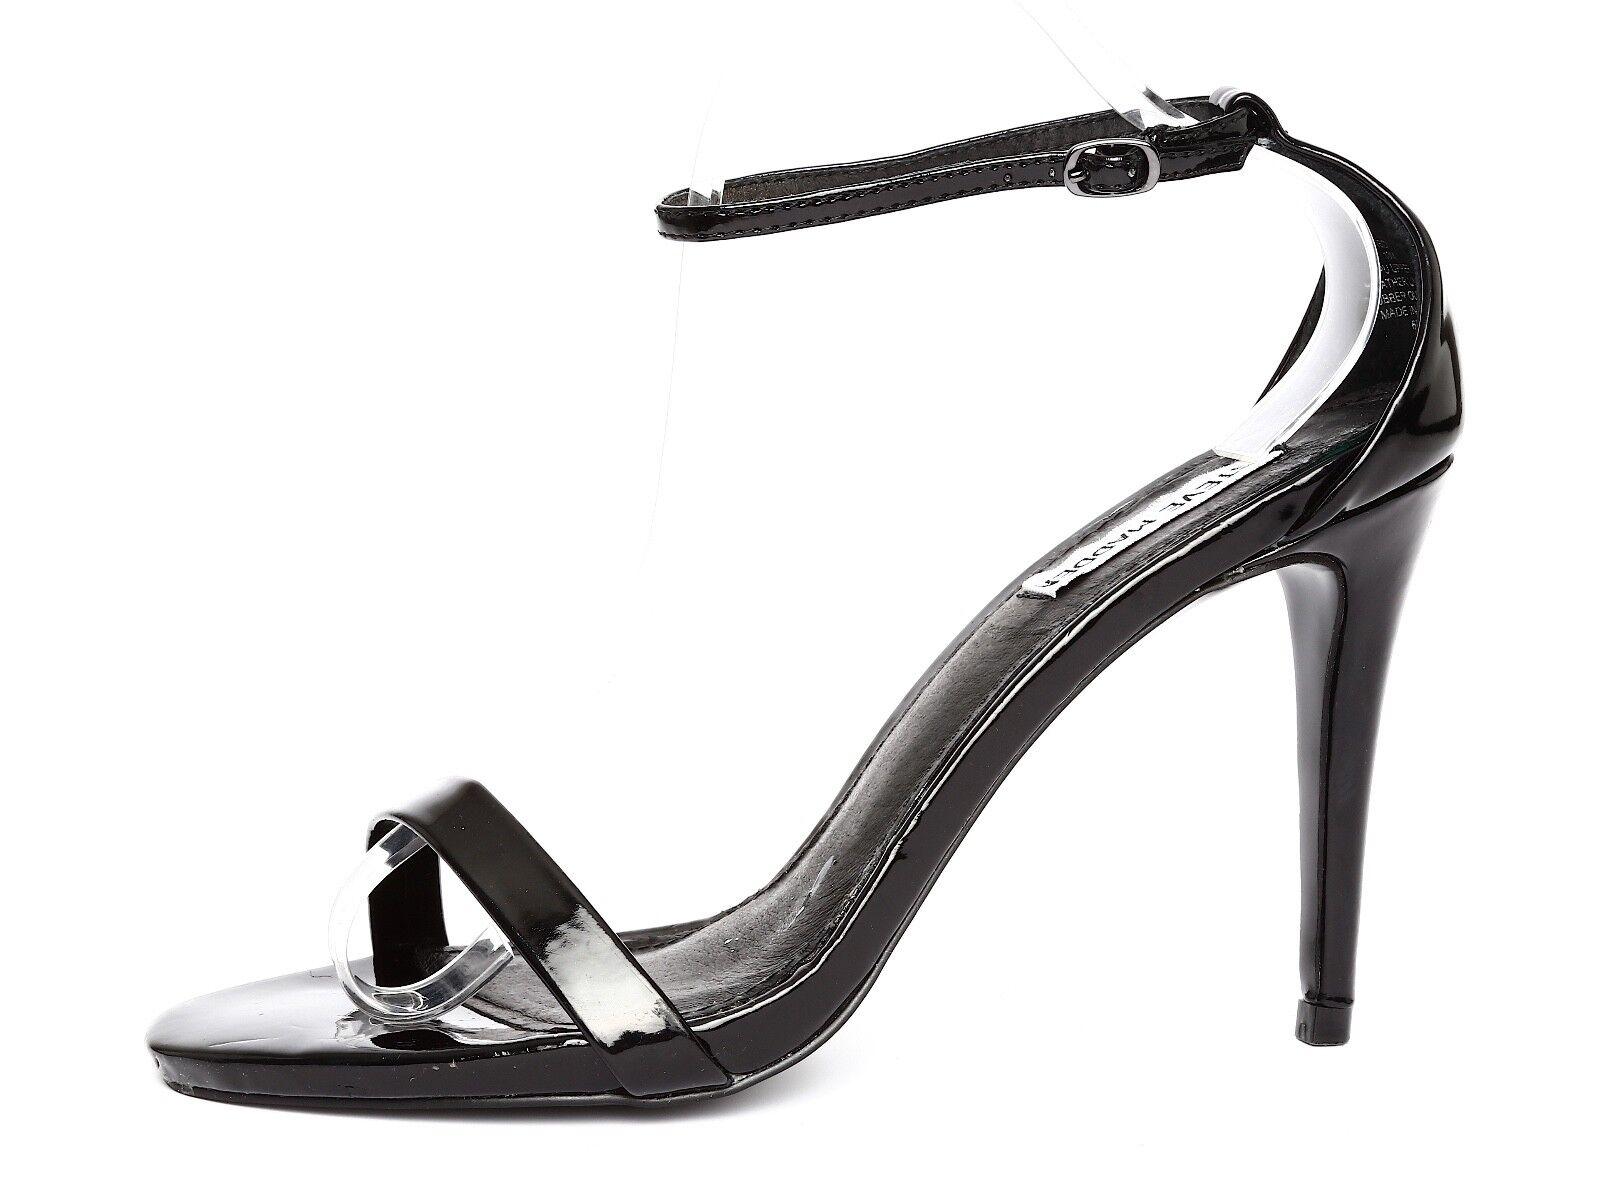 Steve Madden Stecy Patent Leather Black Ankle Strap Sandal Heels Sz 10M 2850